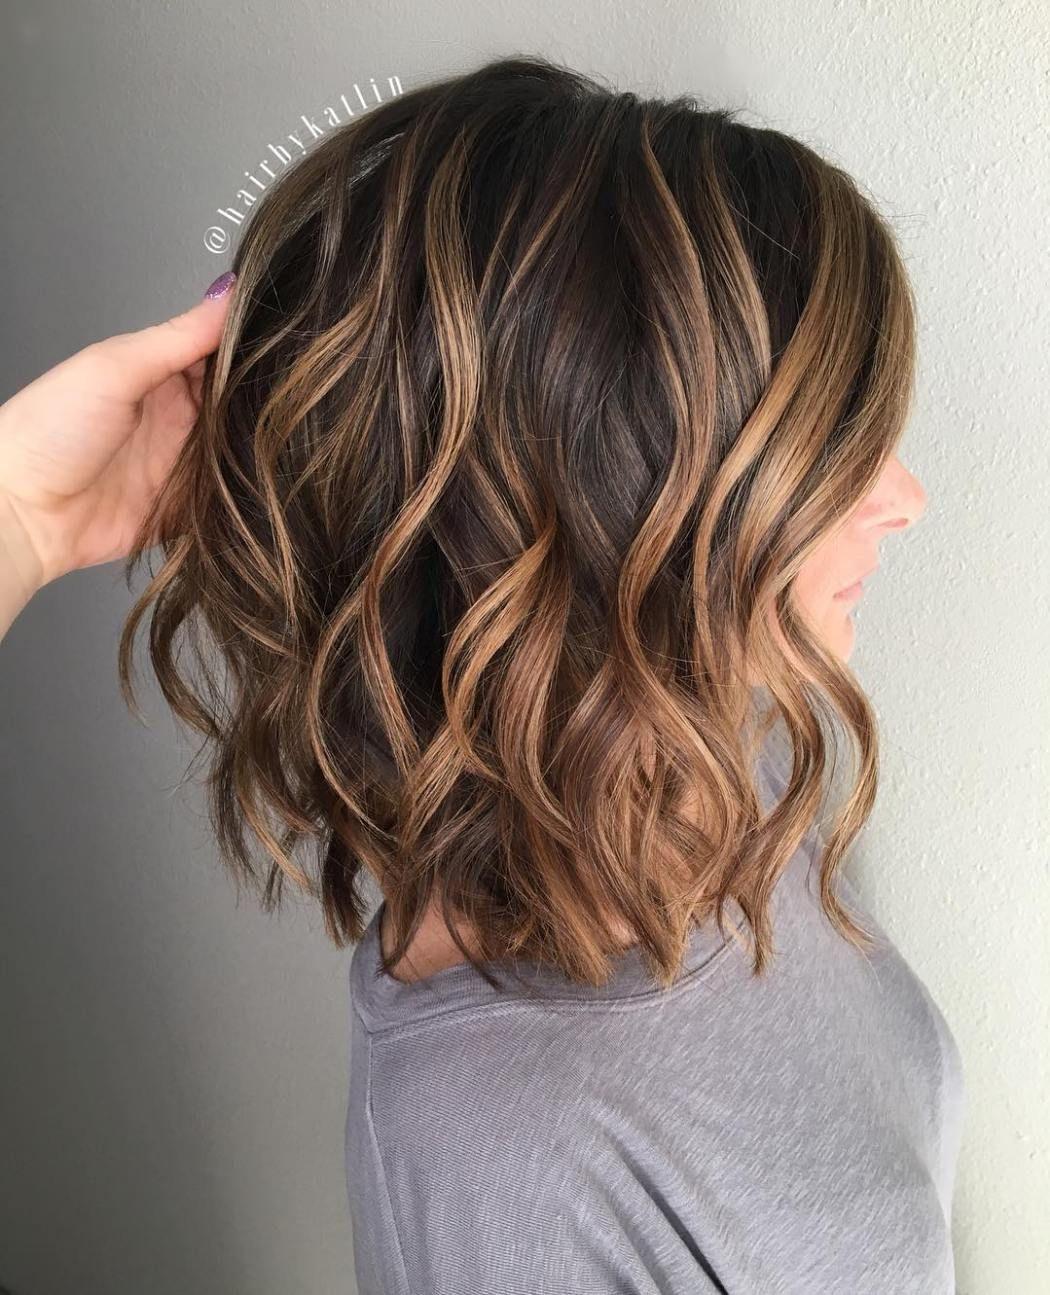 60 Fun and Flattering Medium Hairstyles for Women  hair colors\/ hair cut  Pinterest  Hair